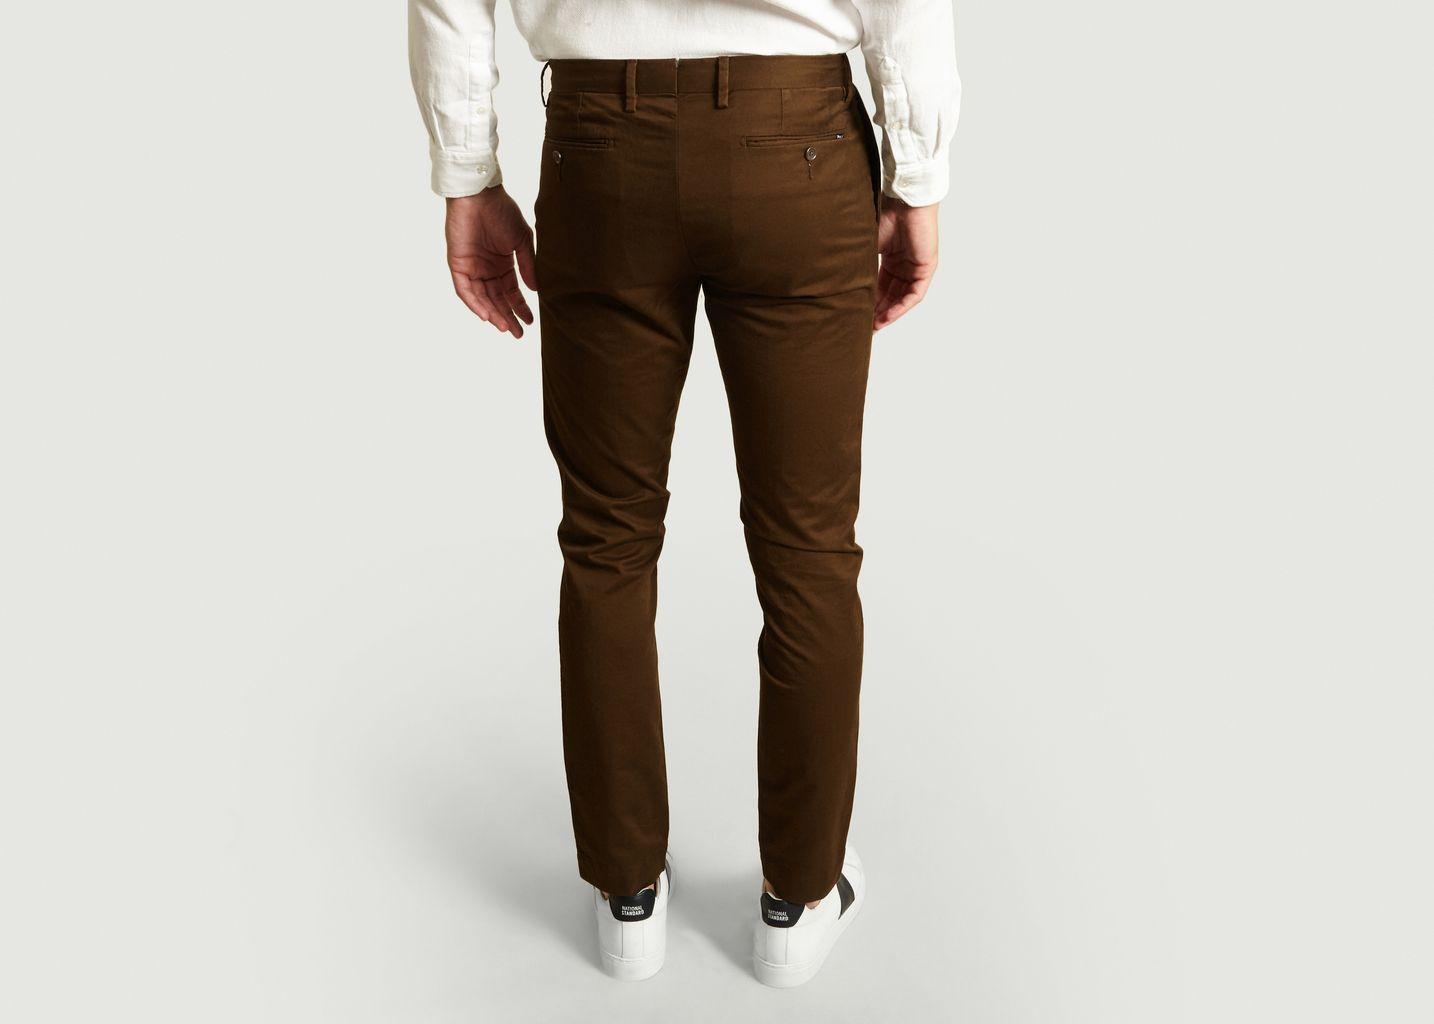 Pantalon Chino - Polo Ralph Lauren